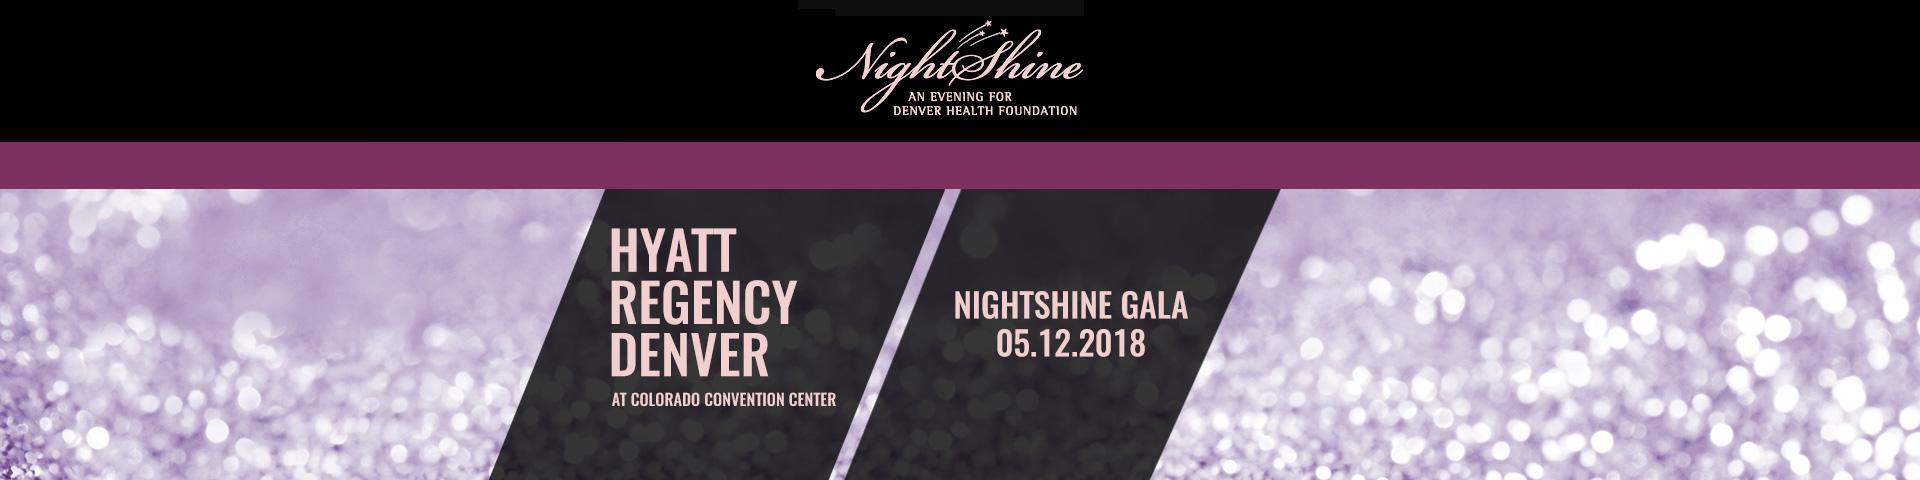 NightShine Gala an evening for Denver Health Foundation